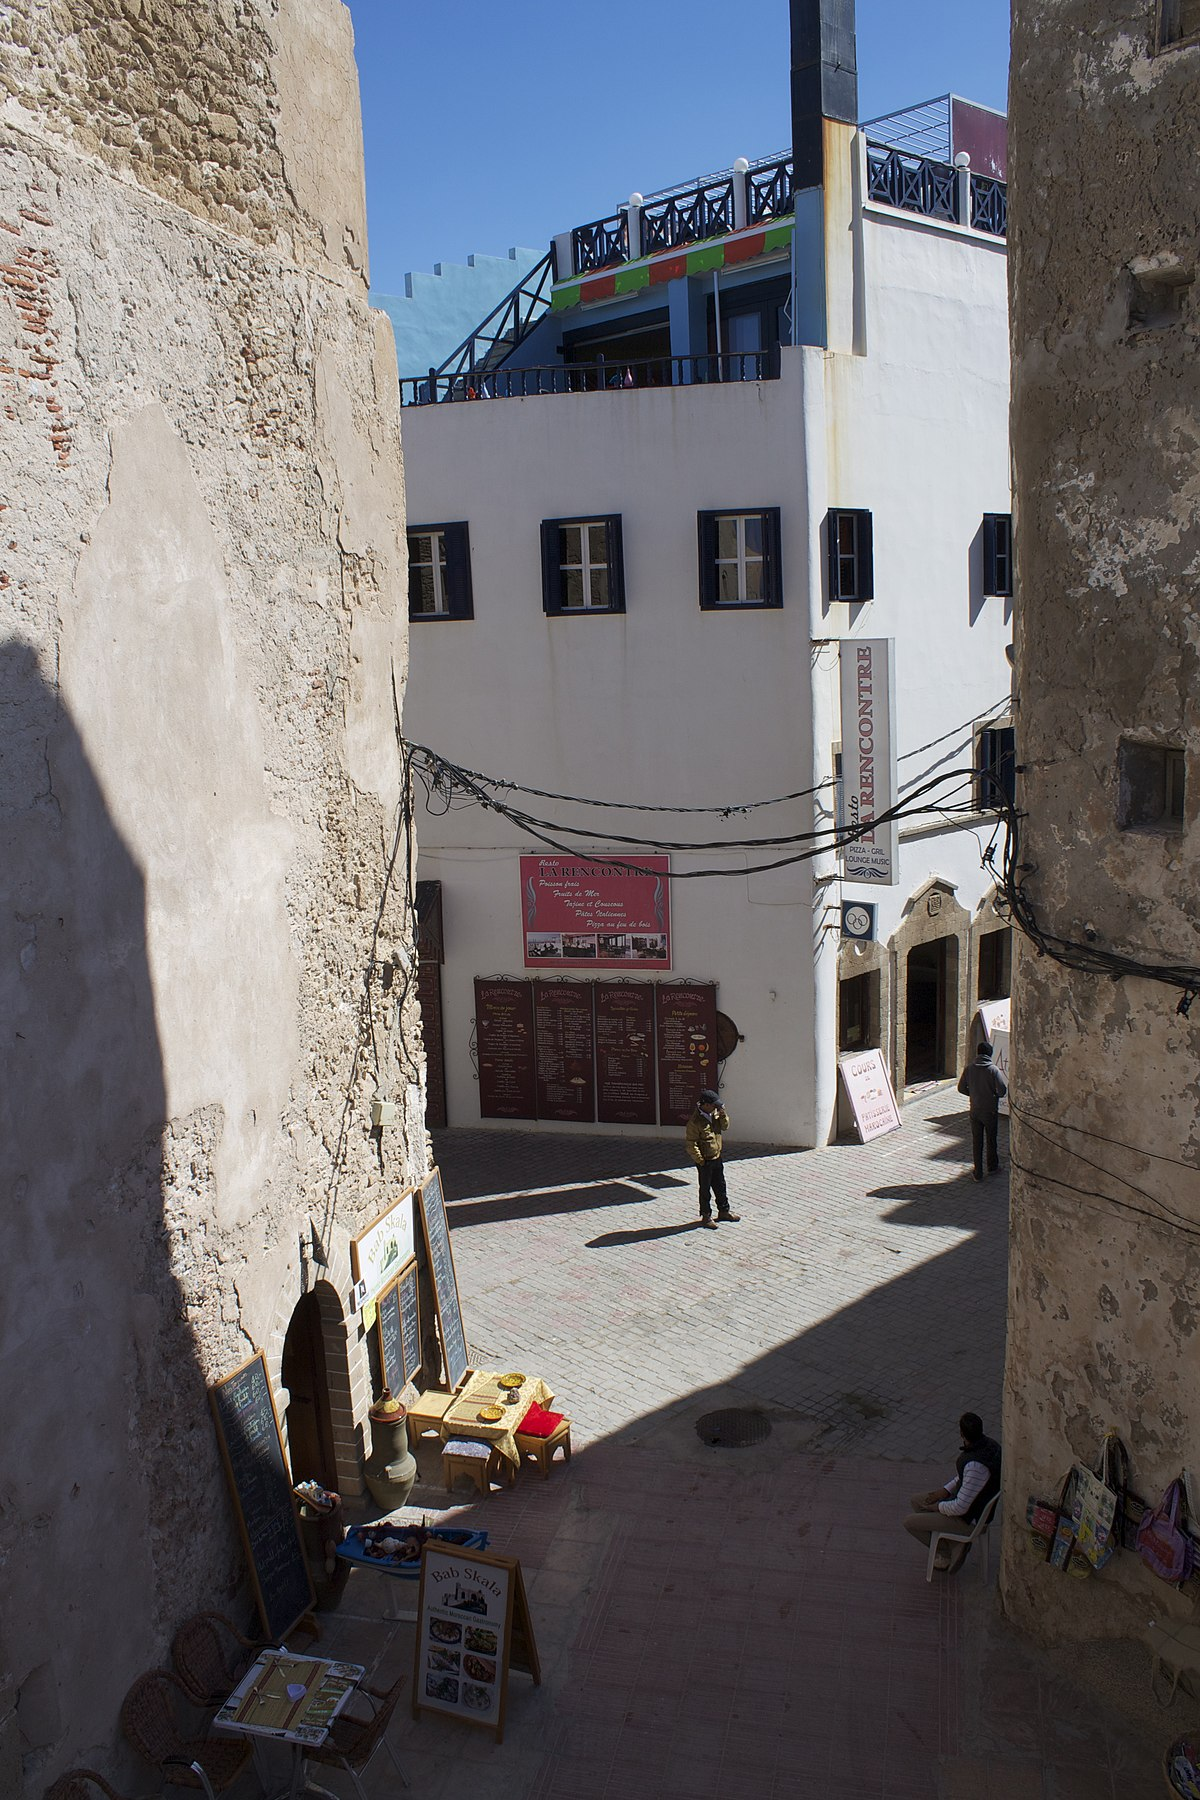 Rencontres à Essaouira